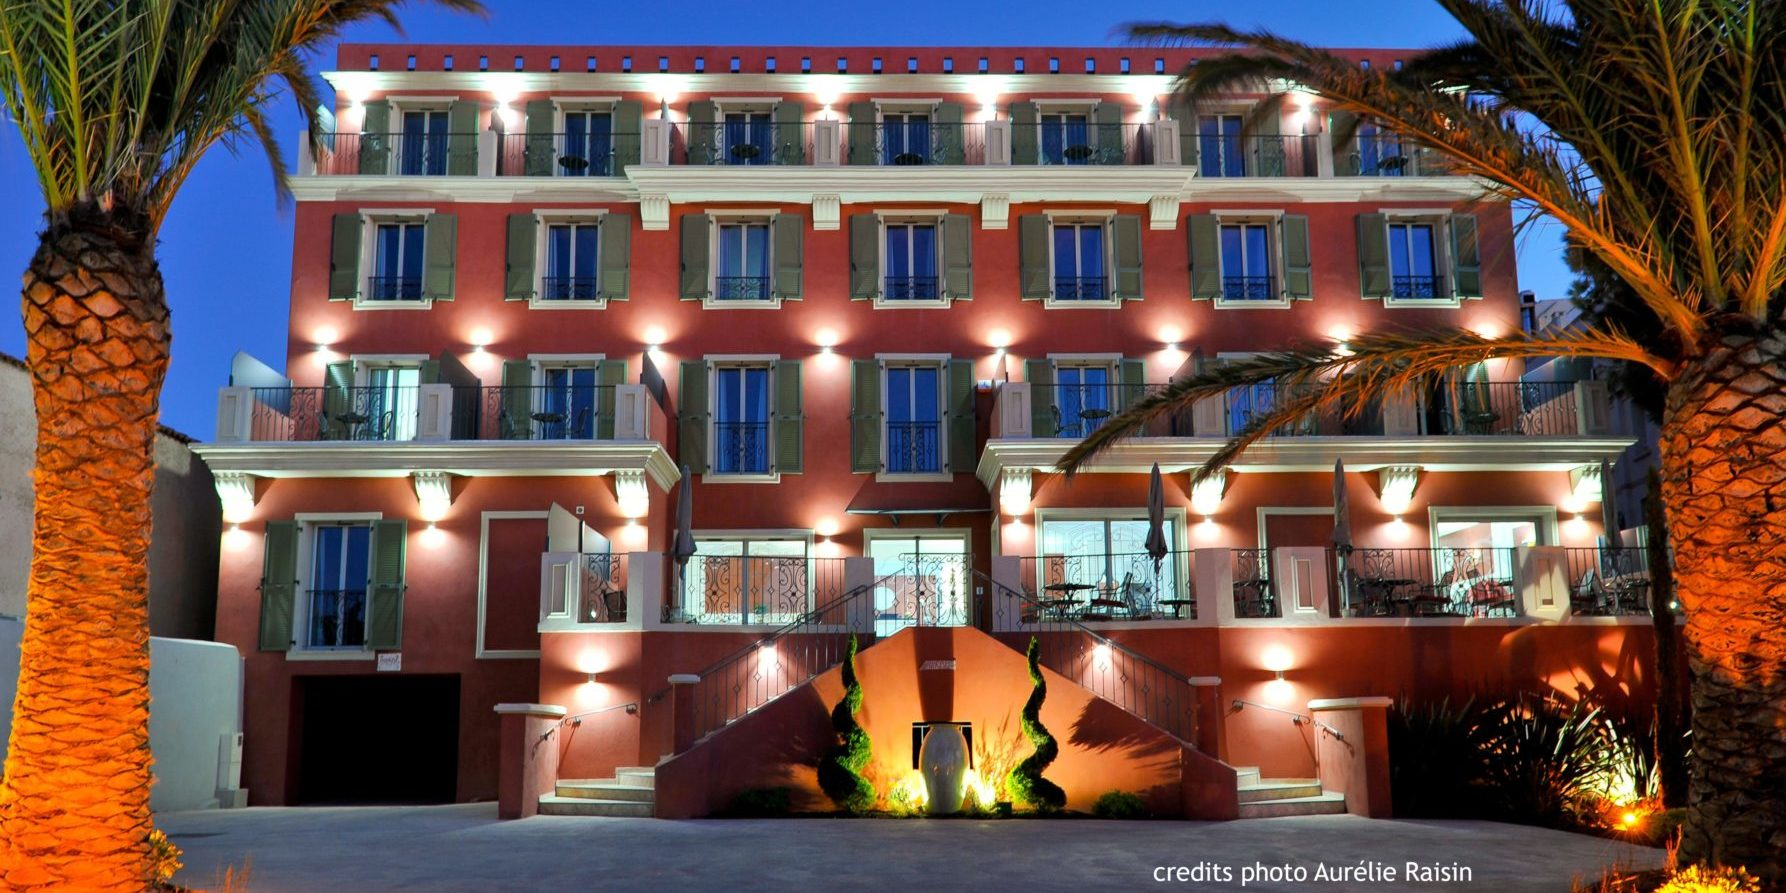 Boutique Hotel Liberata Ile Rousse Balagne Corsica Frankrijk exterieur vooraanzicht palmbomen